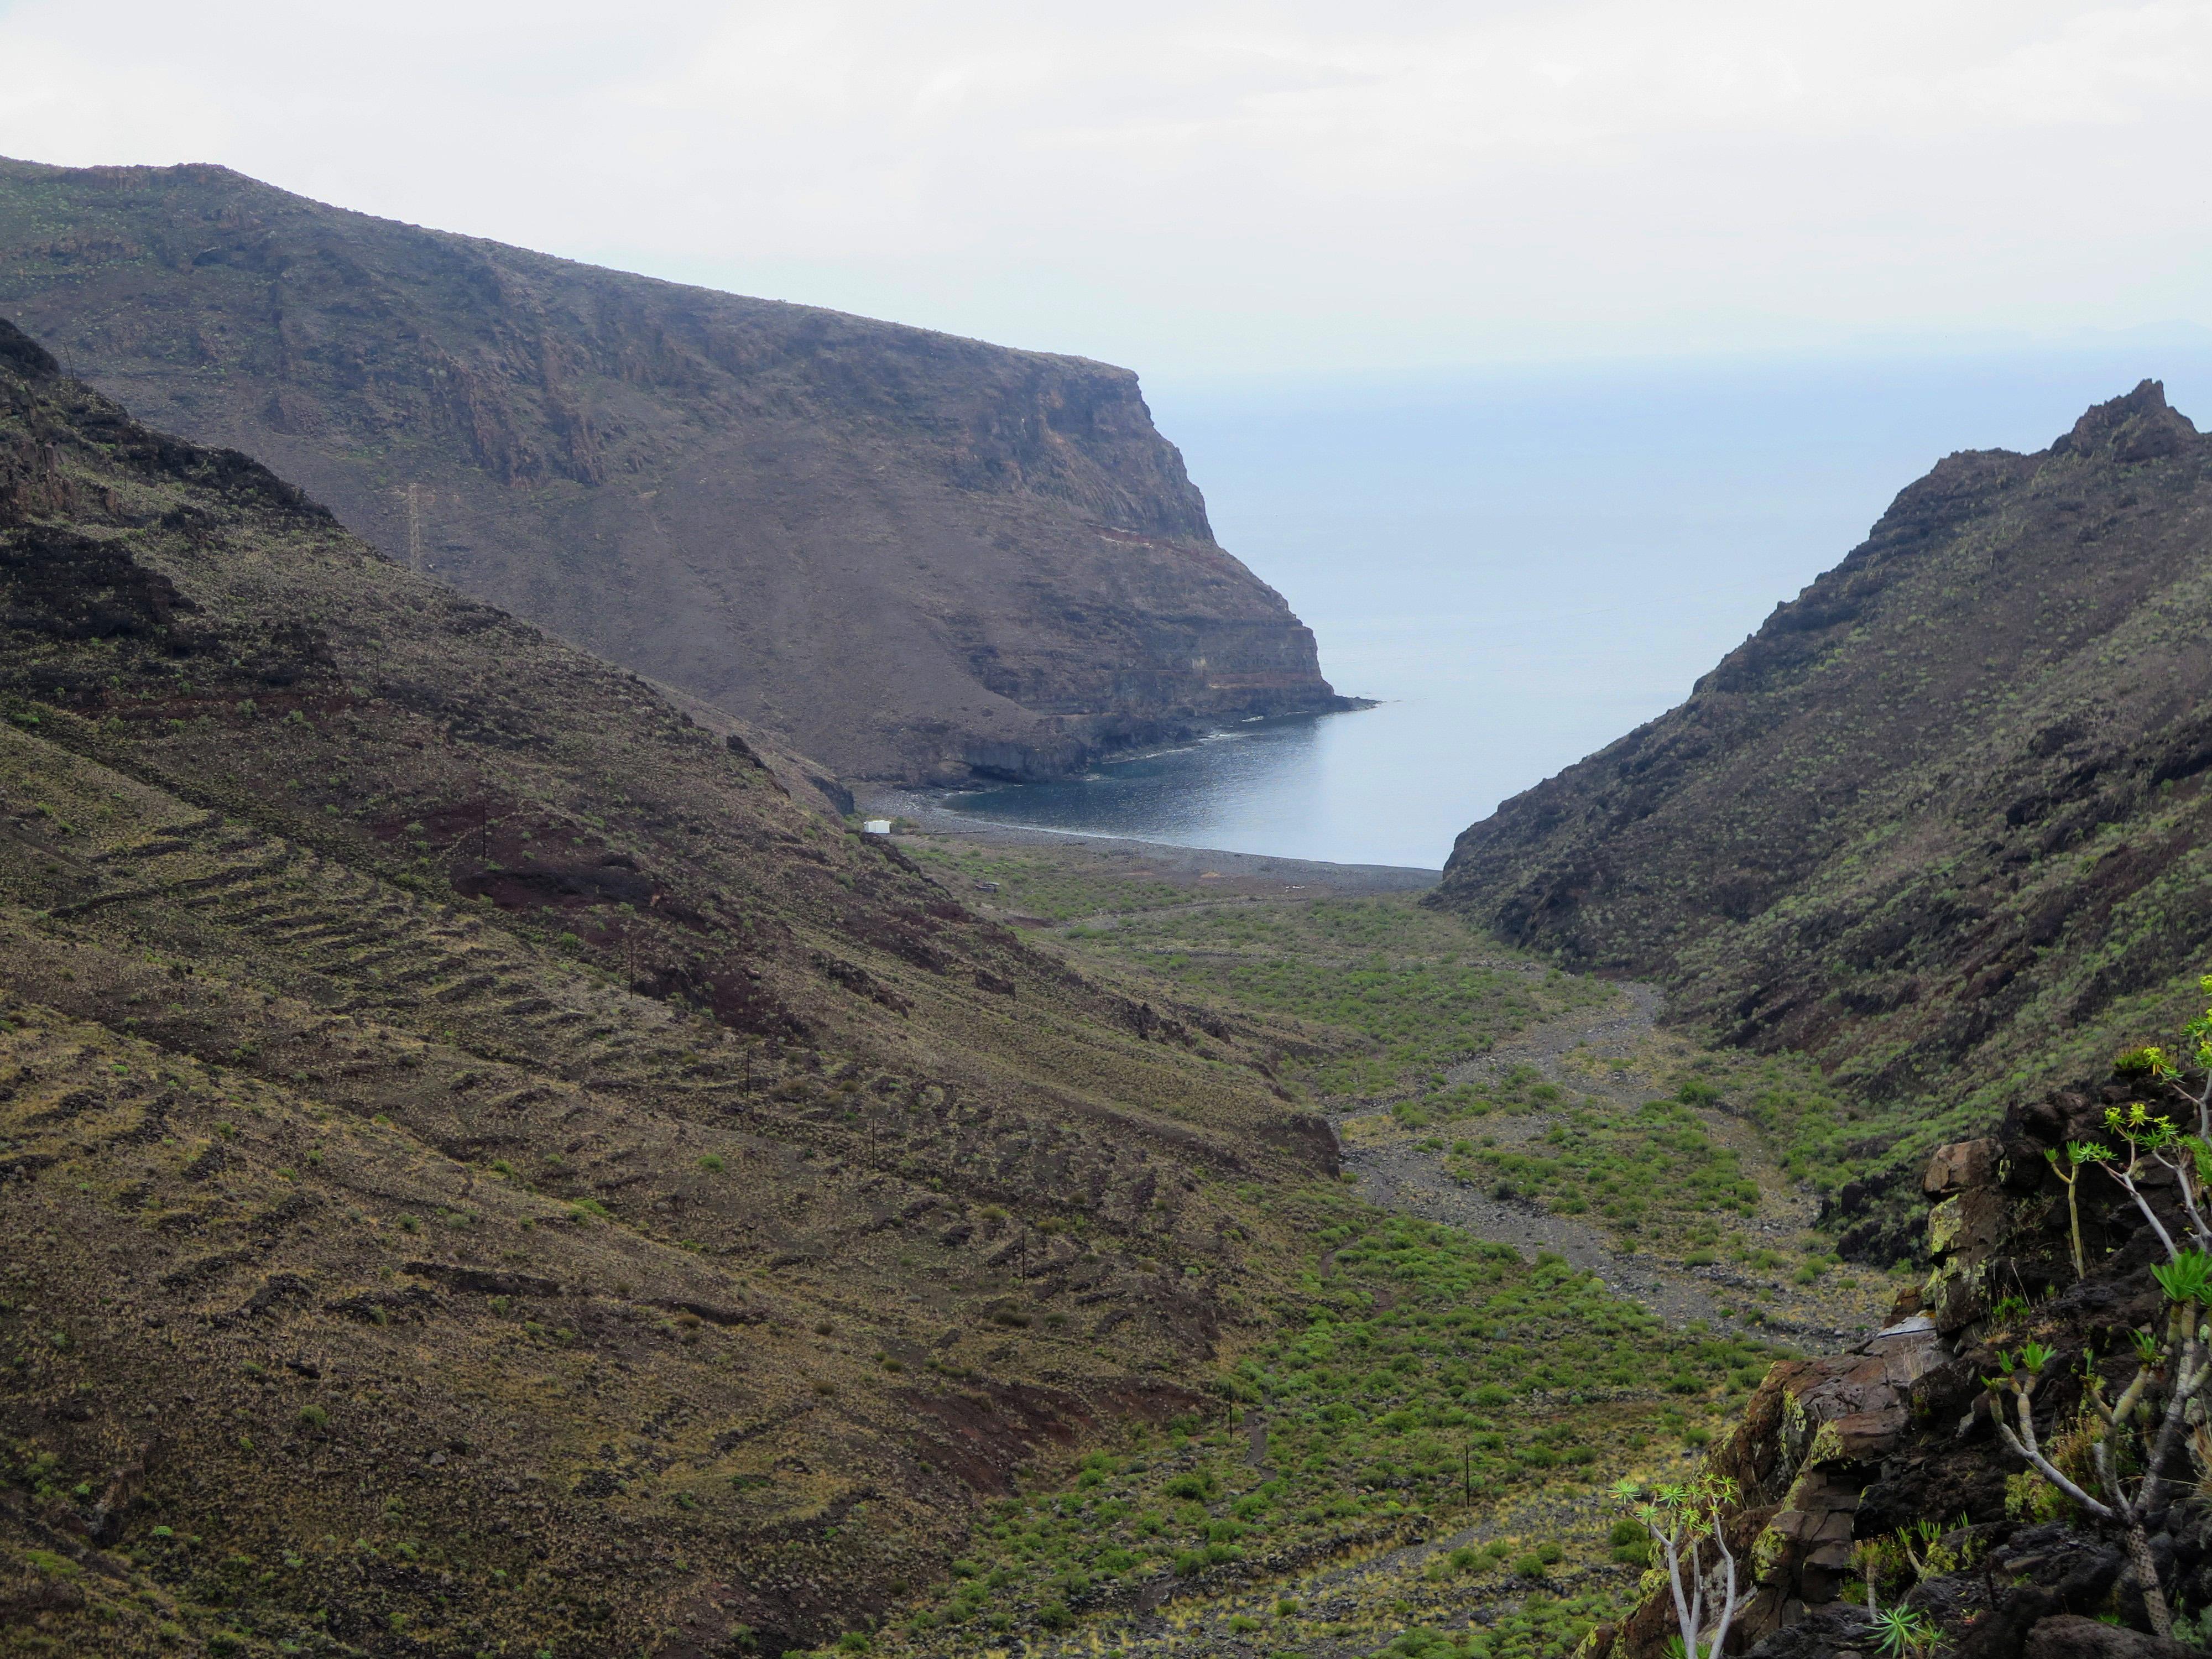 La Gomera. Barranco del Cabrito, La Guancha, San Sebastian